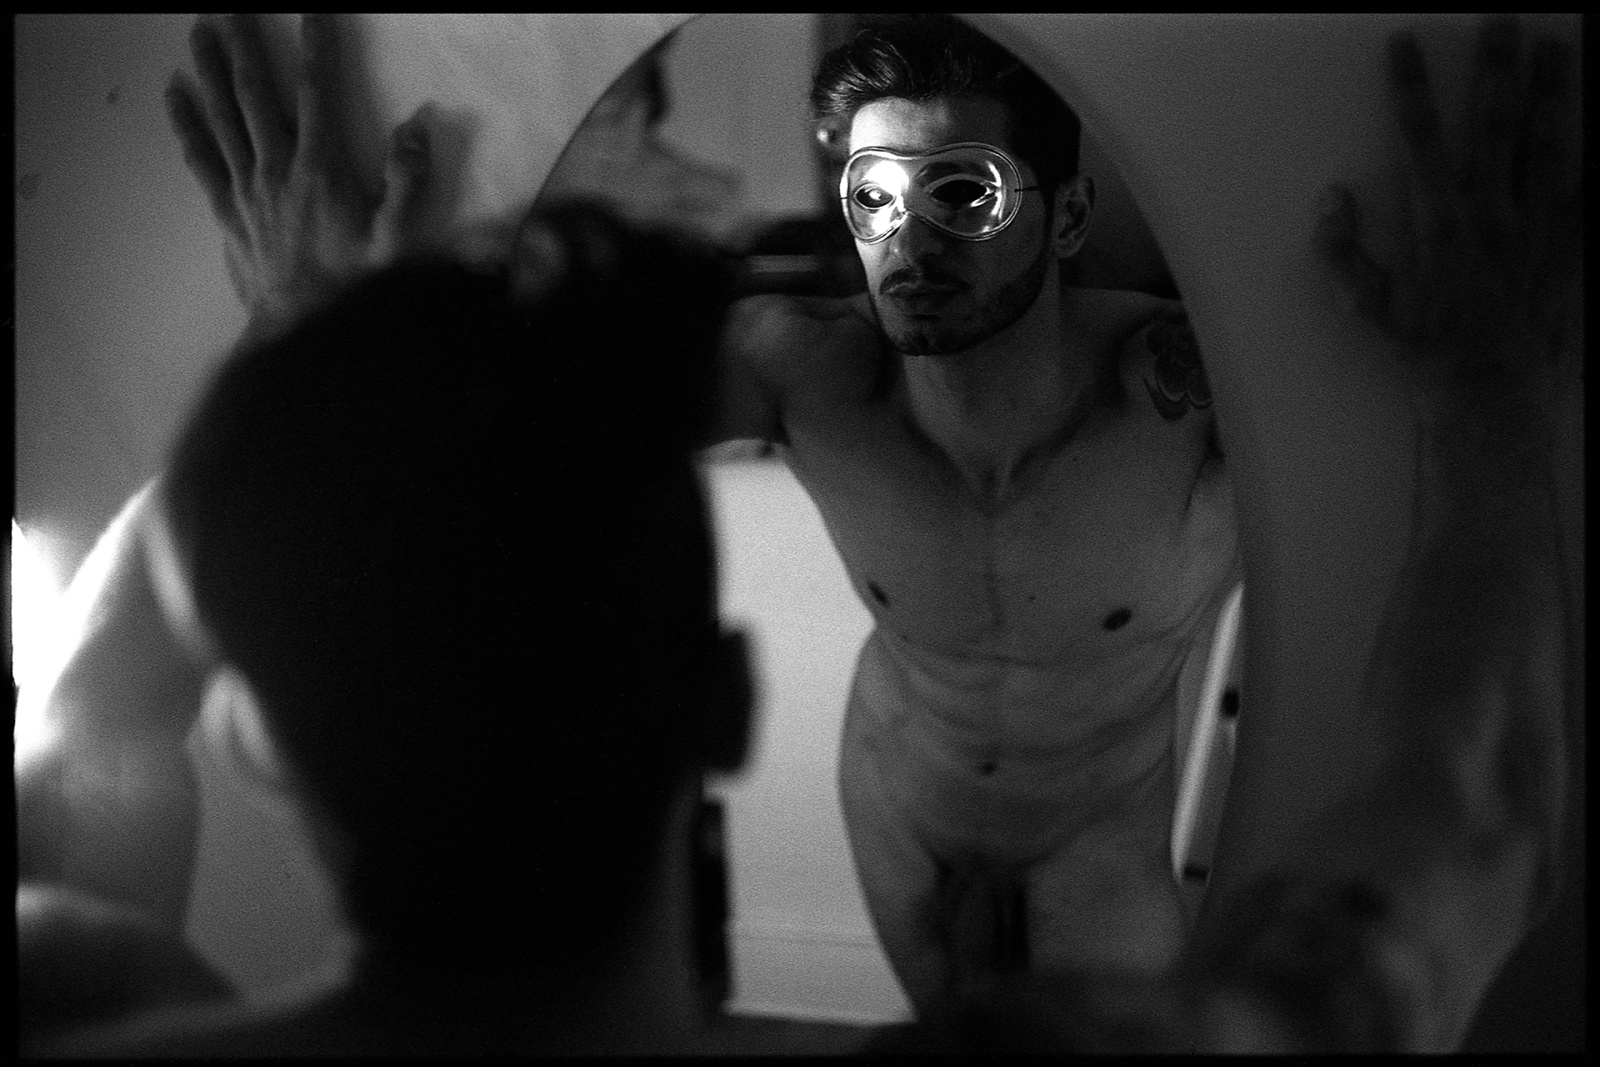 Roberto, 2014. © Loredana Denicola.